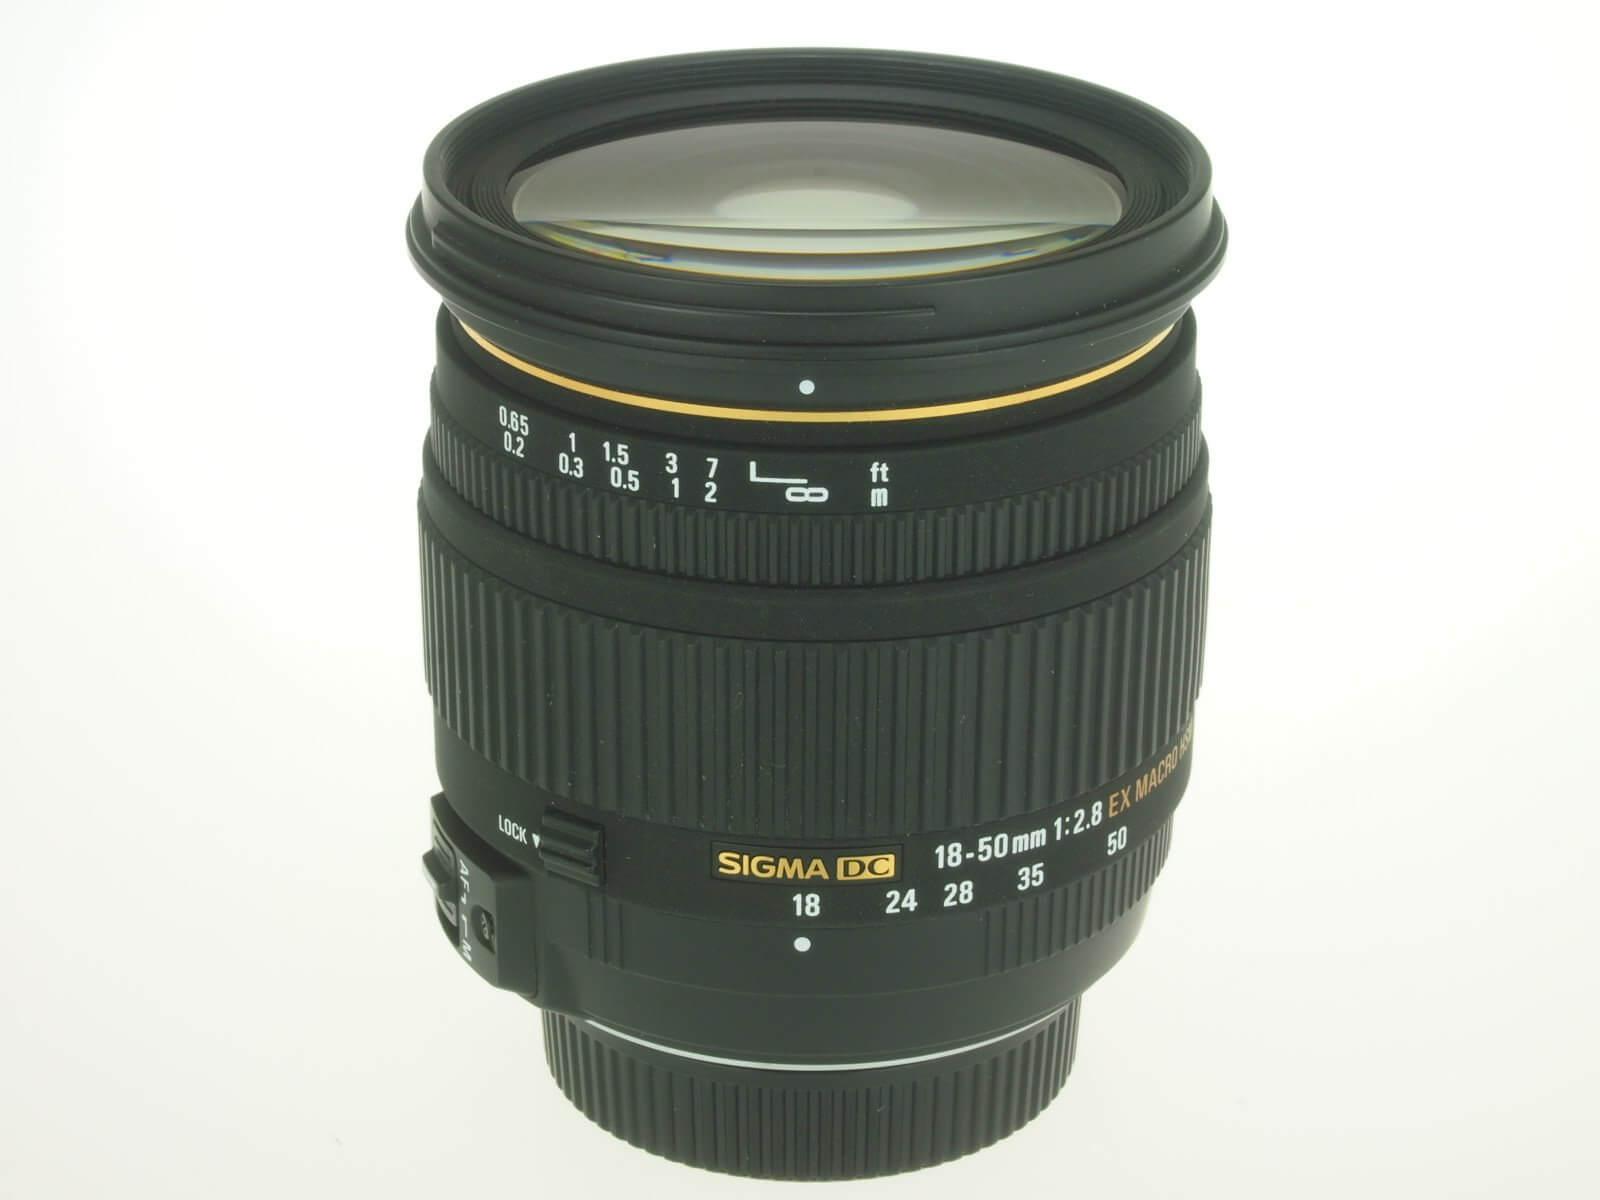 Sigma 18-50mm f2.8 DC EX lens, Nikon mount, mint condition!